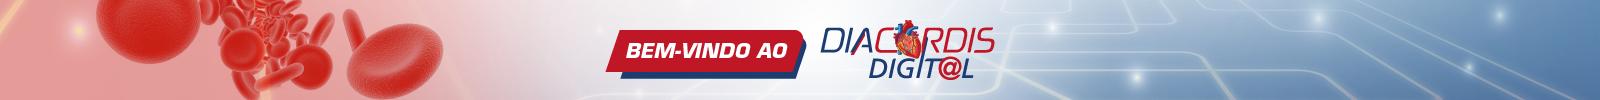 DC-banners 1000-BEM VINDO